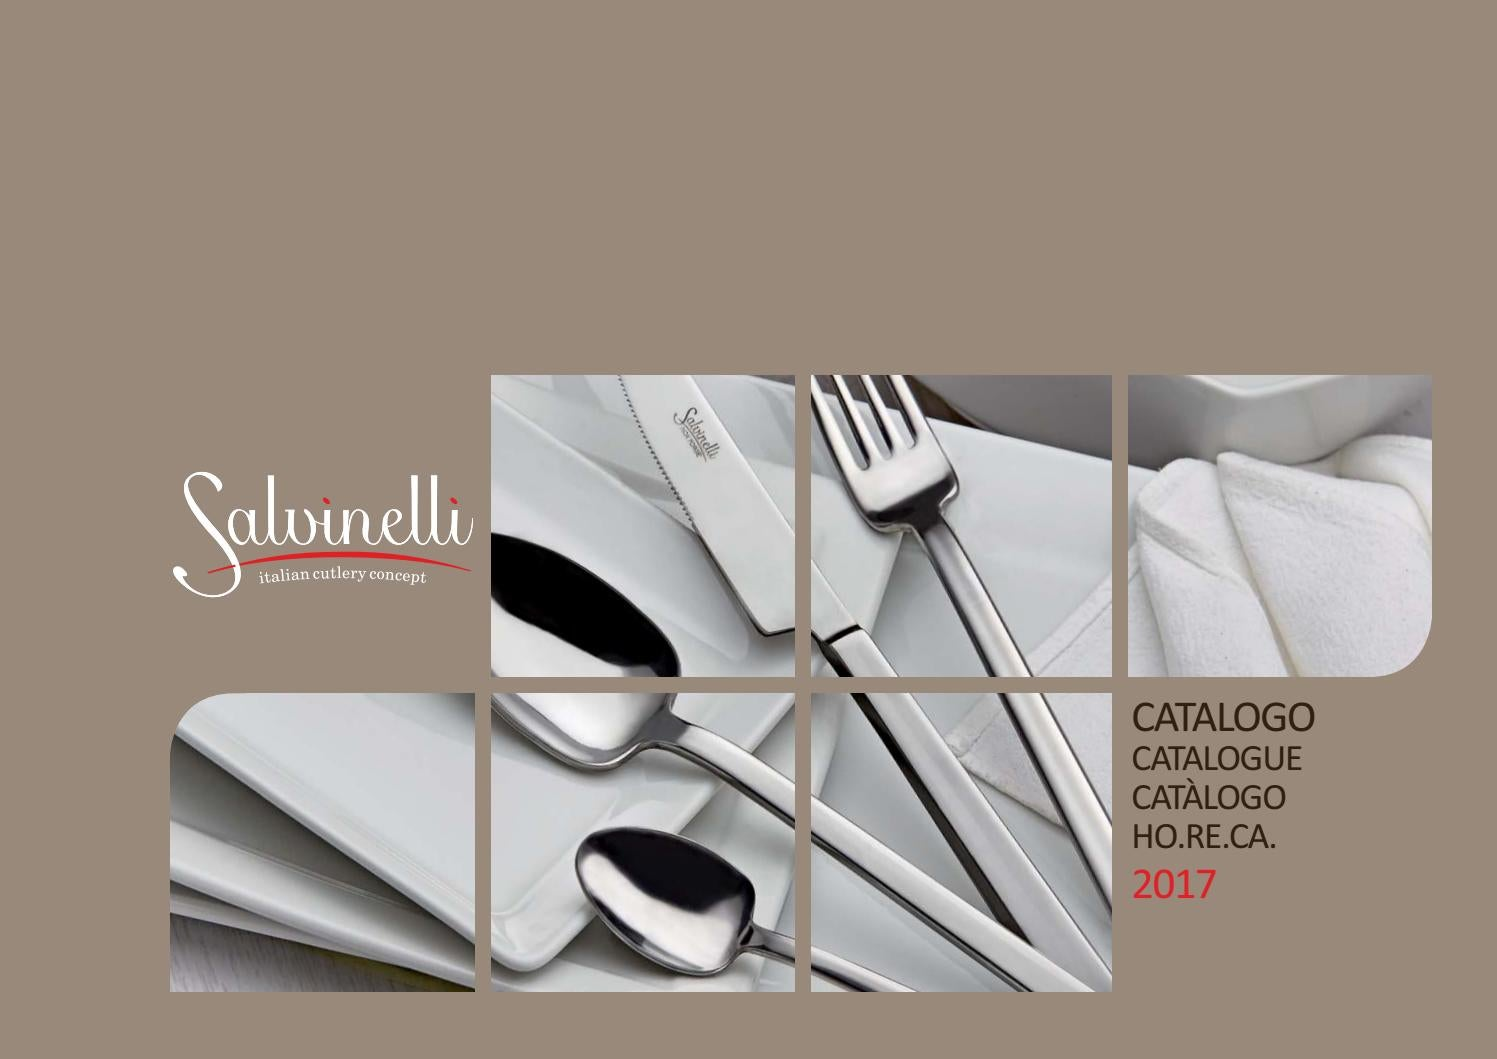 Acero Inoxidable Salvinelli Pan Cesta 8/cm 30/x 20/x 8/cm